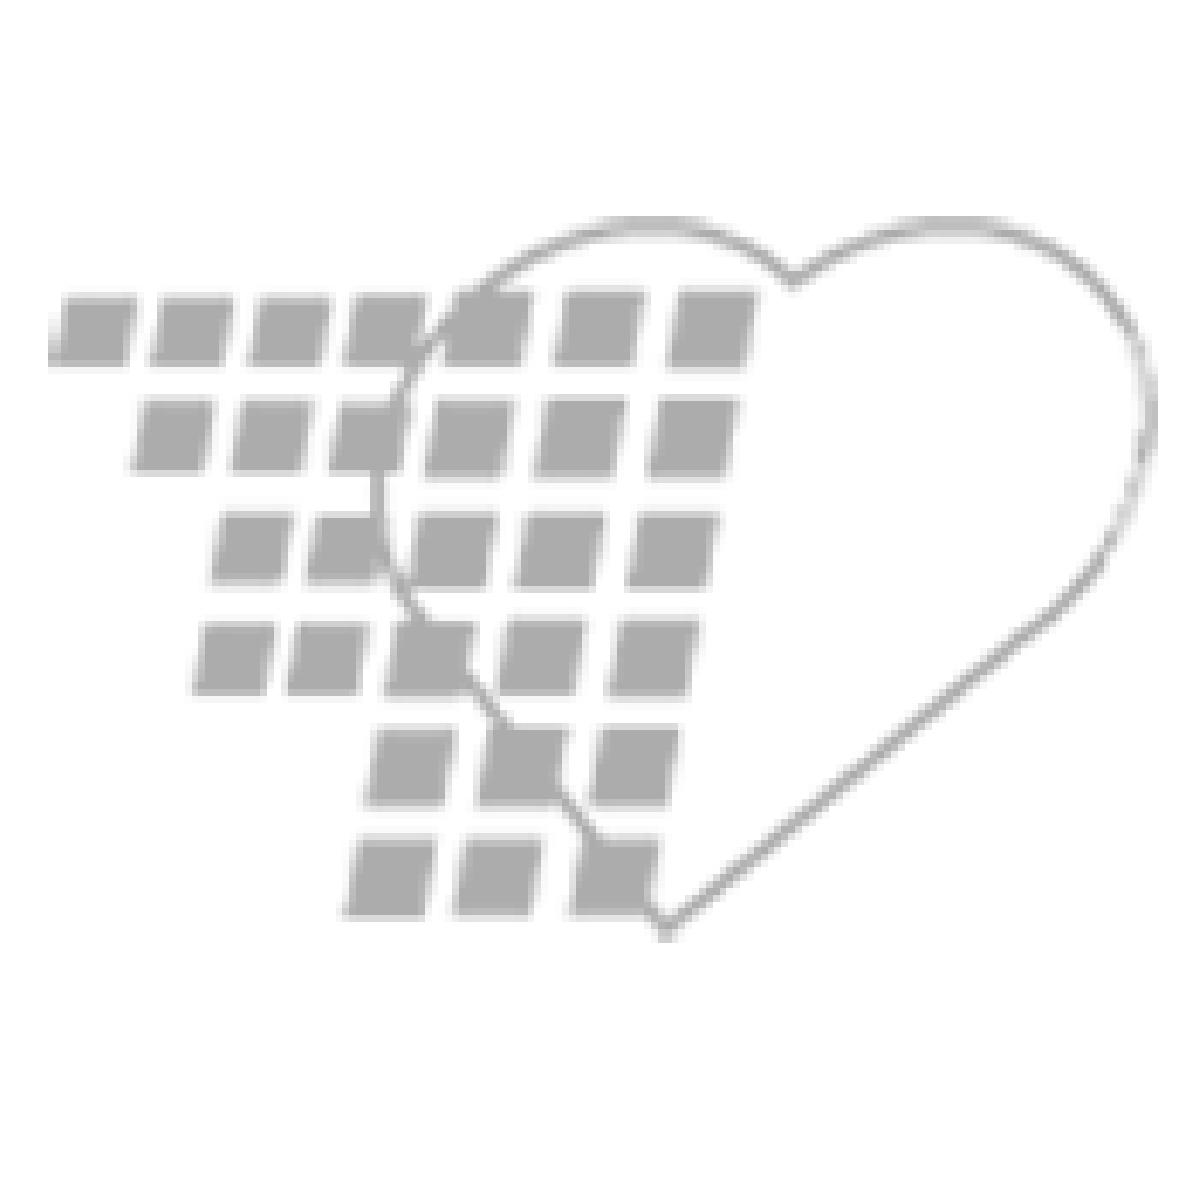 11-81-0994 Nasco Life/form® Cricothyrotomy Simulator